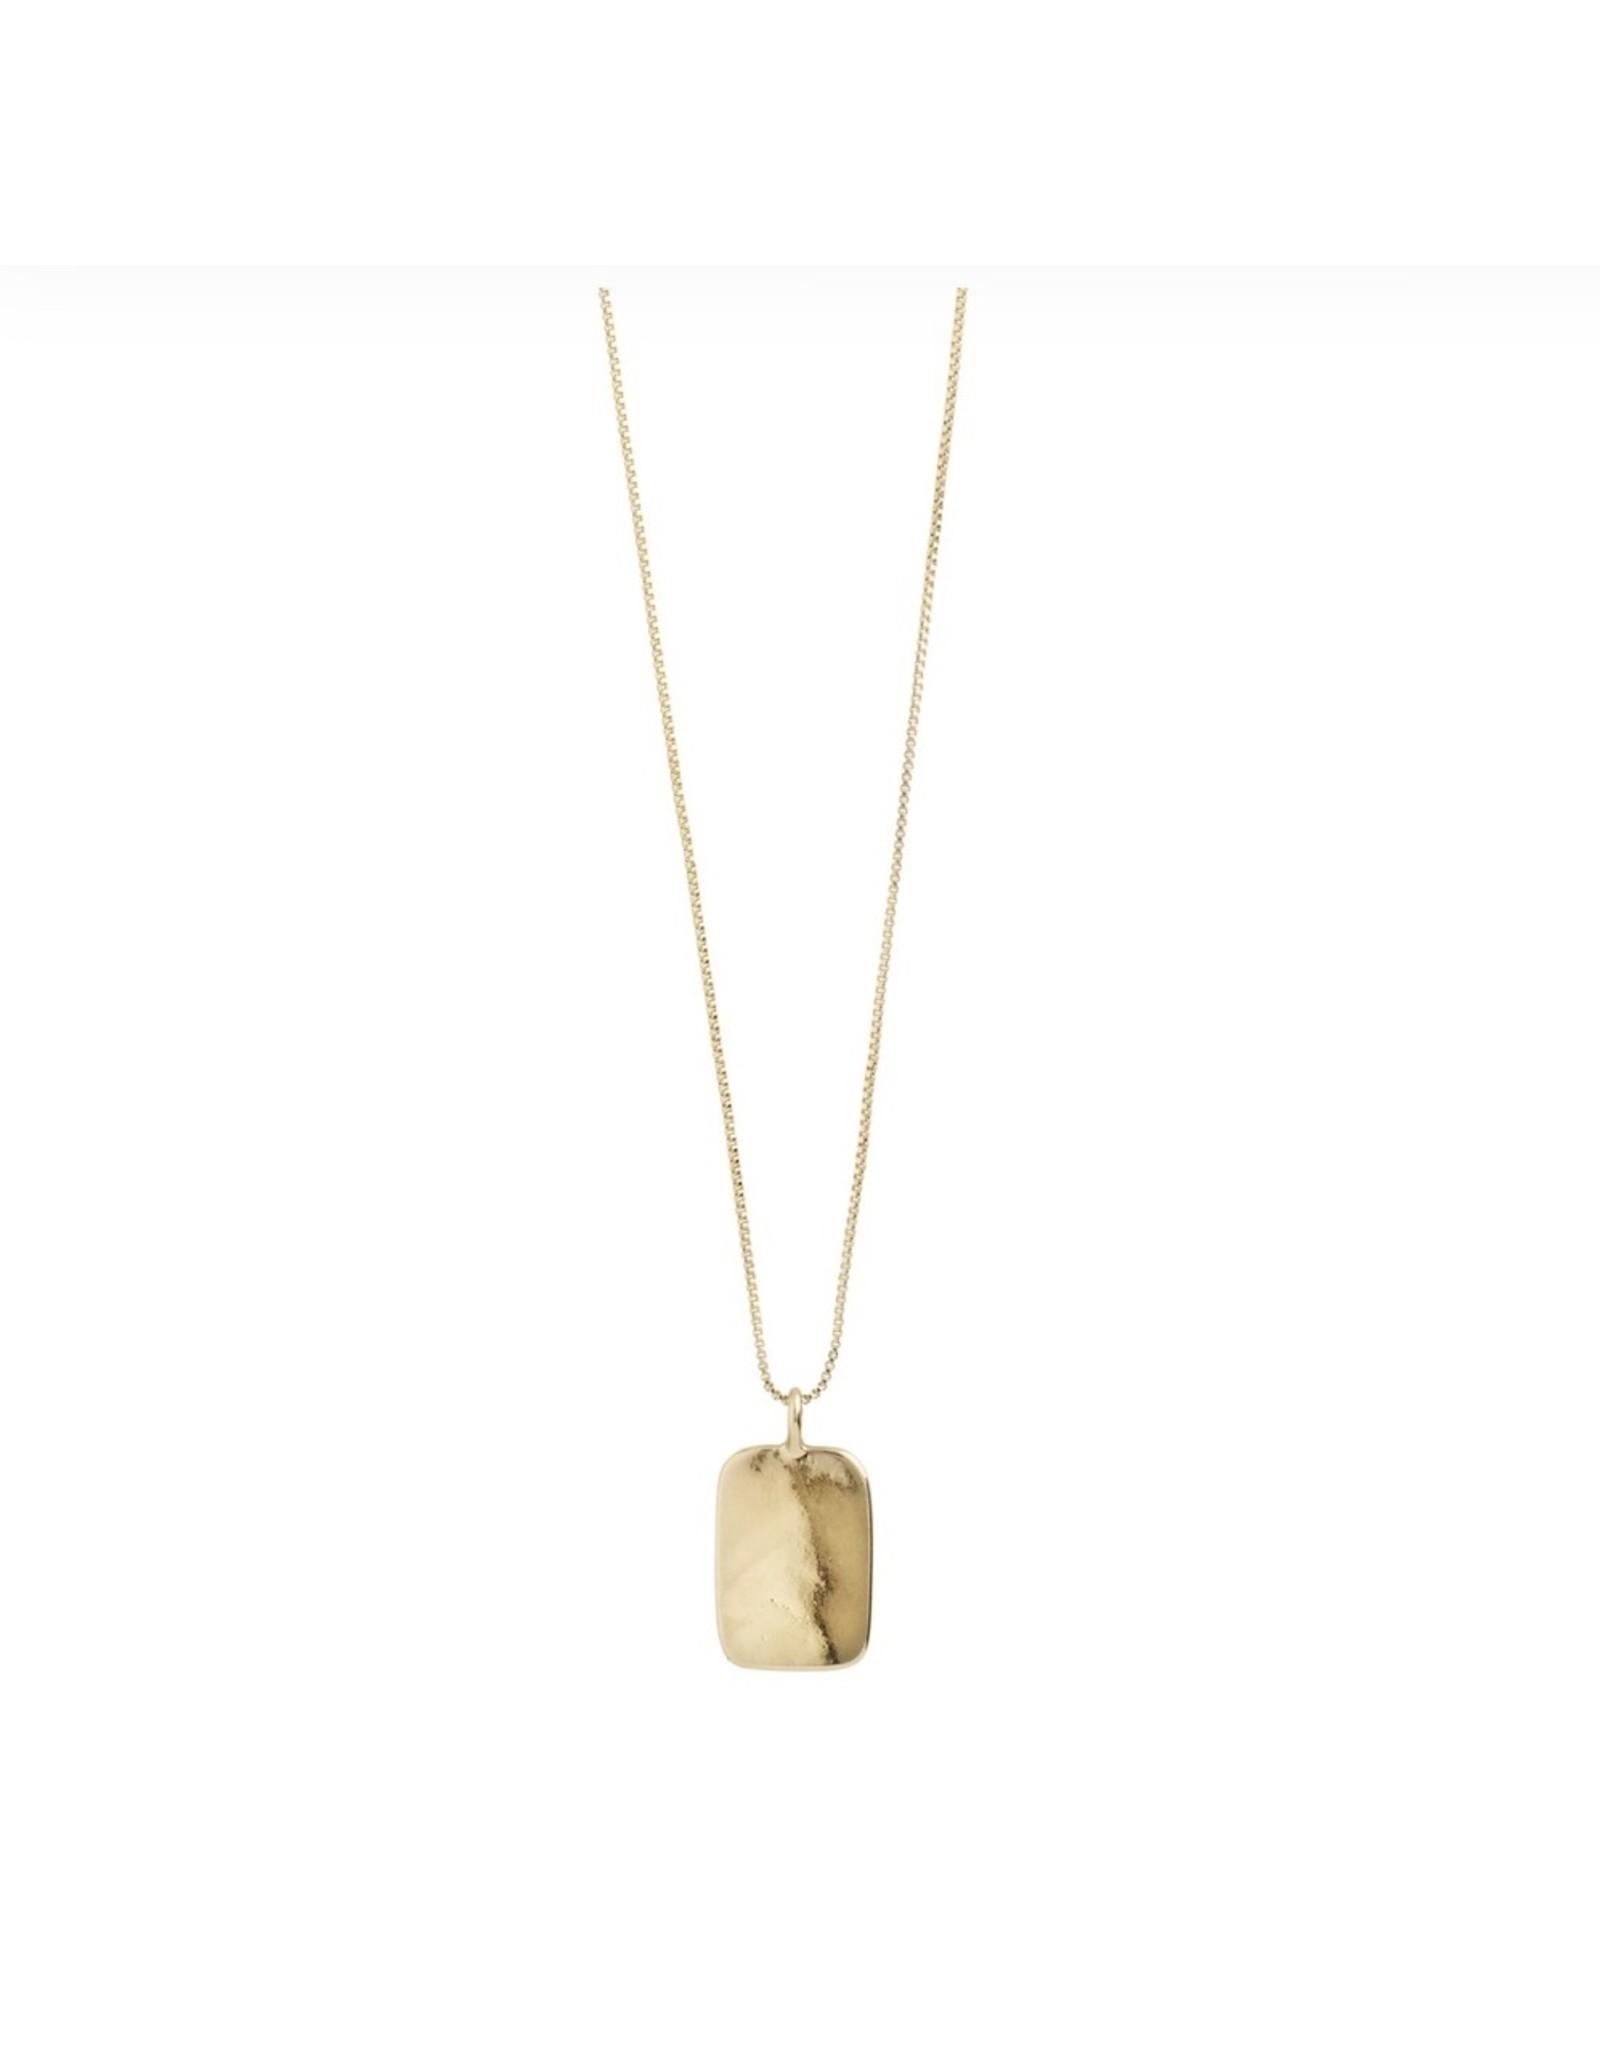 Pilgrim Pilgrim Necklace, Intuition, Gold Plated